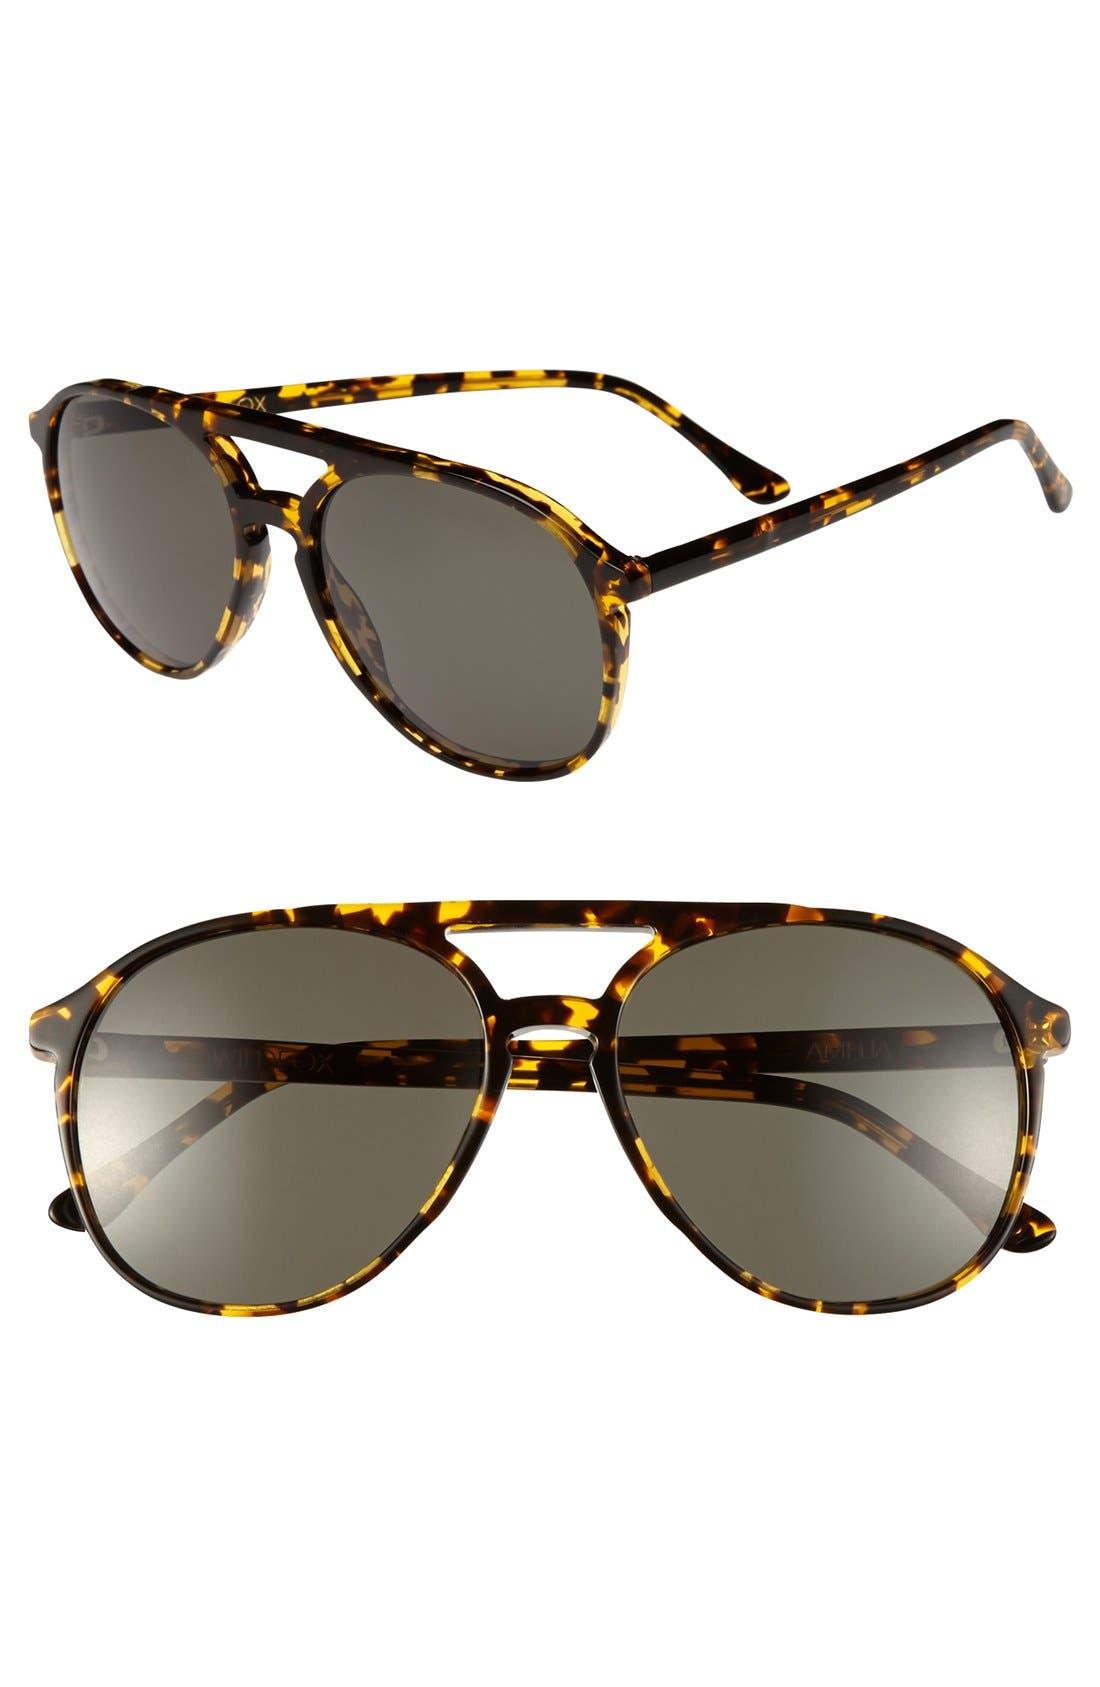 Main Image - Wildfox 'Amelia' Sunglasses